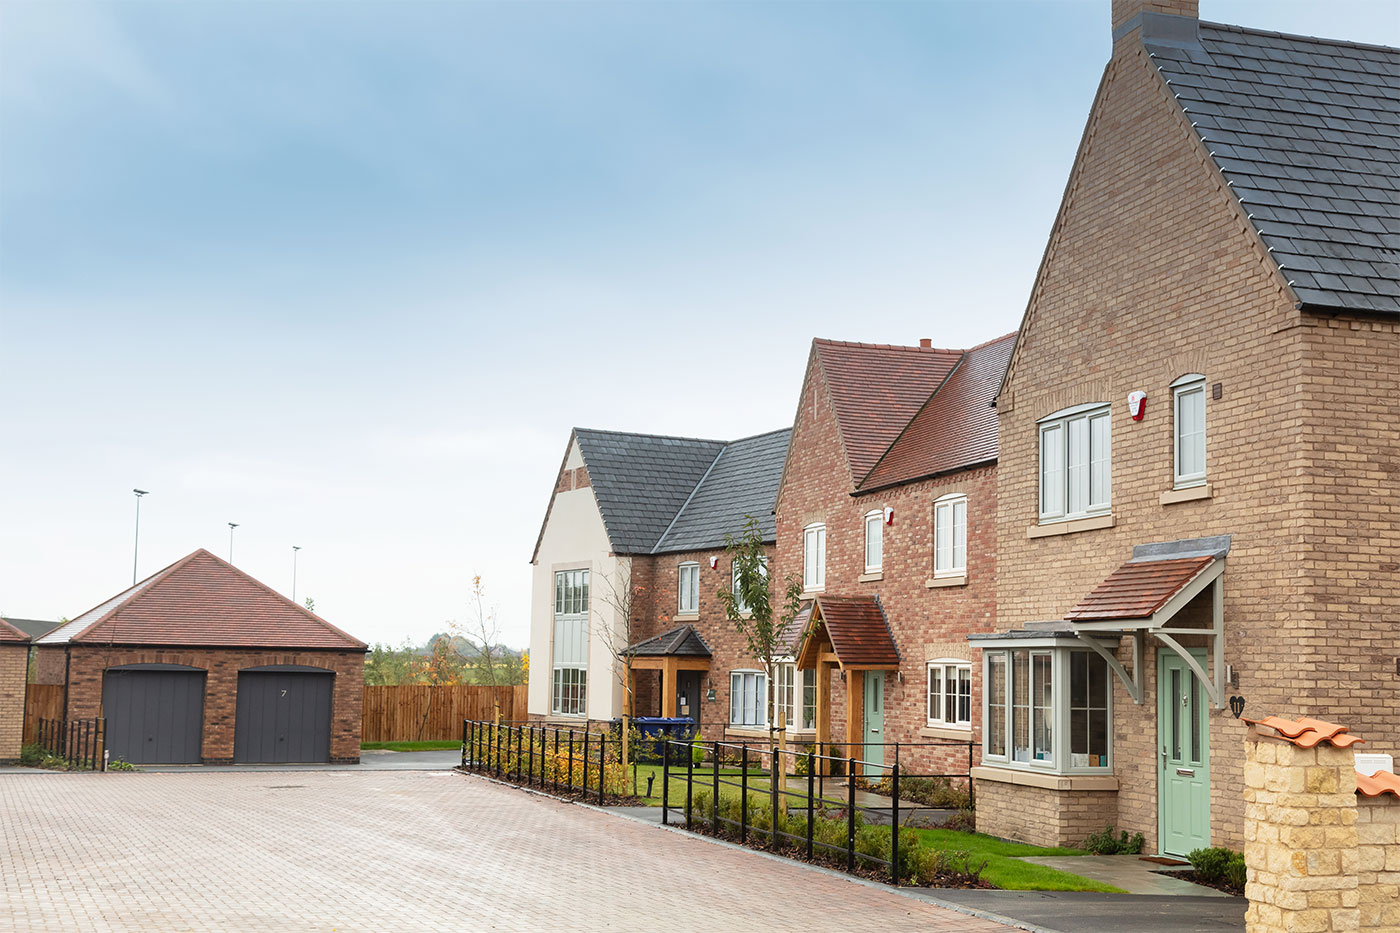 A row of 3 houses on Lodge Lane in Nettleham